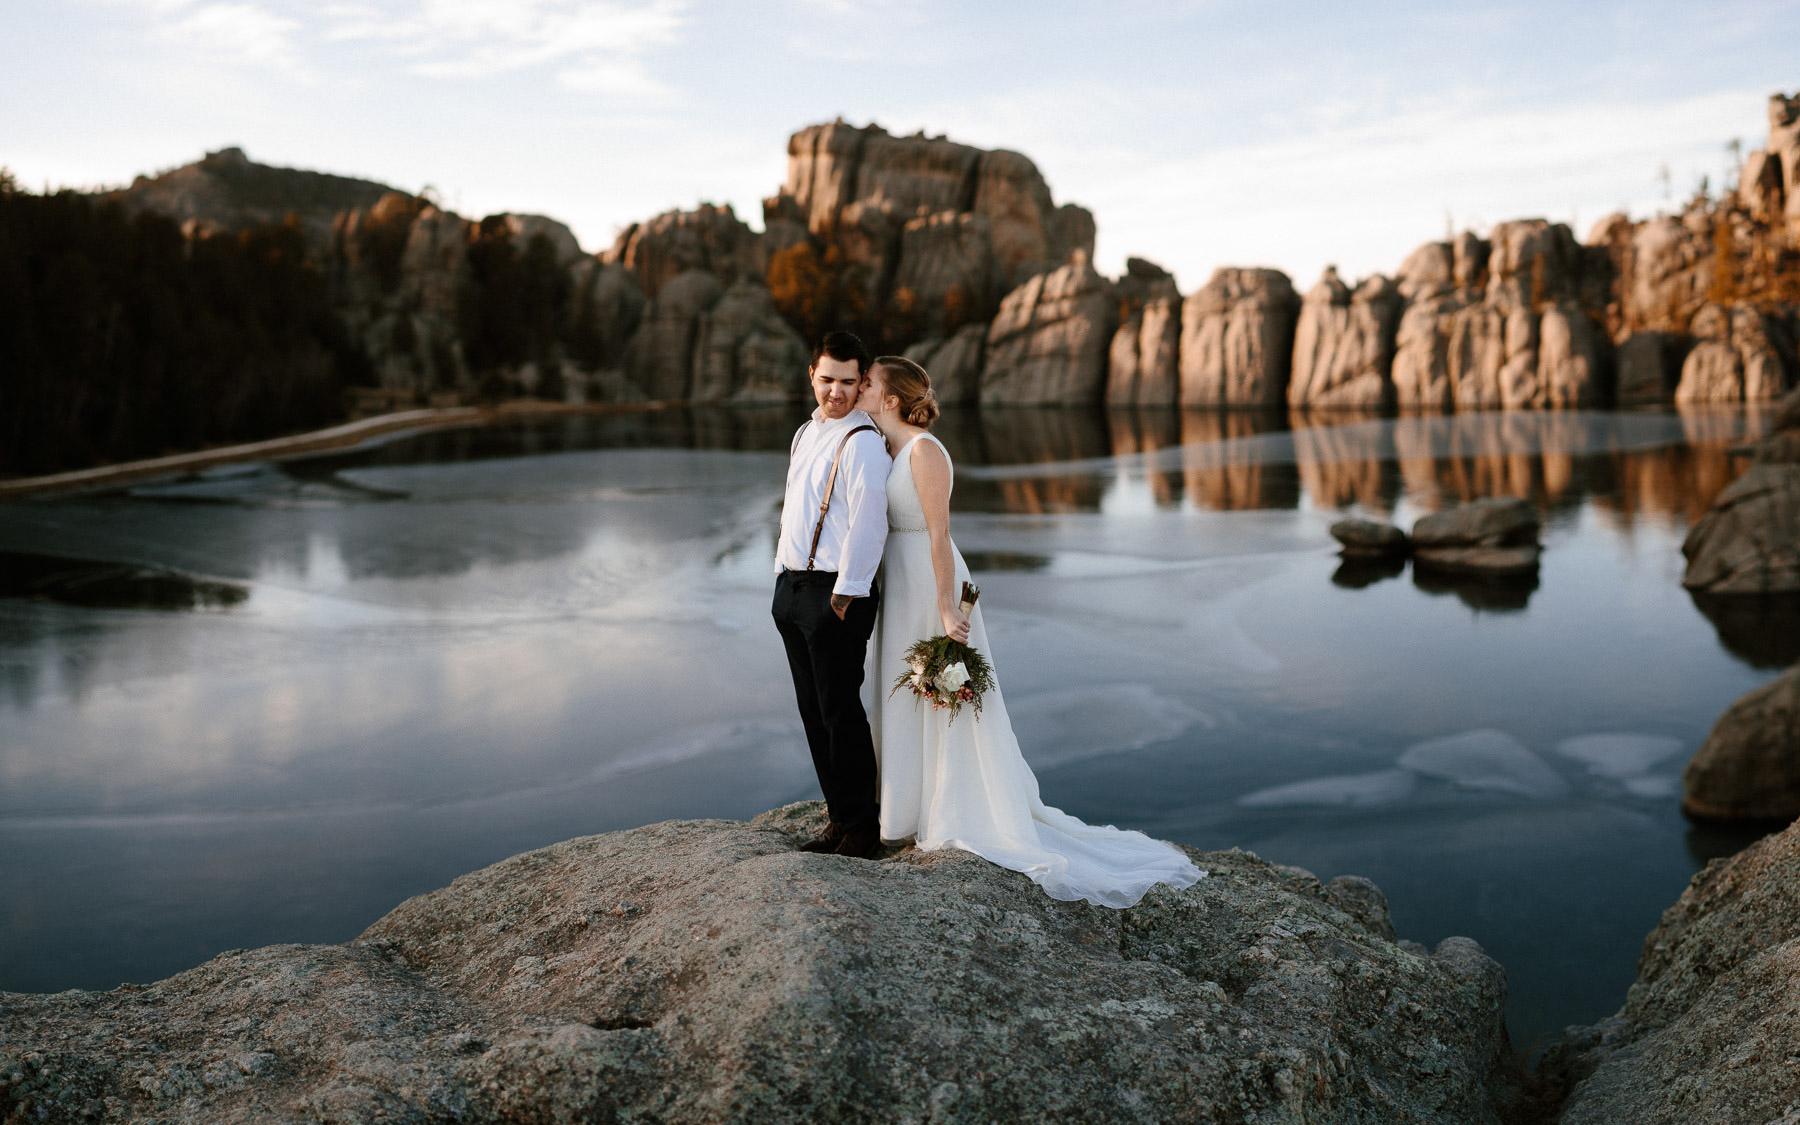 sioux-falls-black-hills-rapid-city-elopement-wedding-adventure-photographer-custer-sylvan-lake-29.jpg